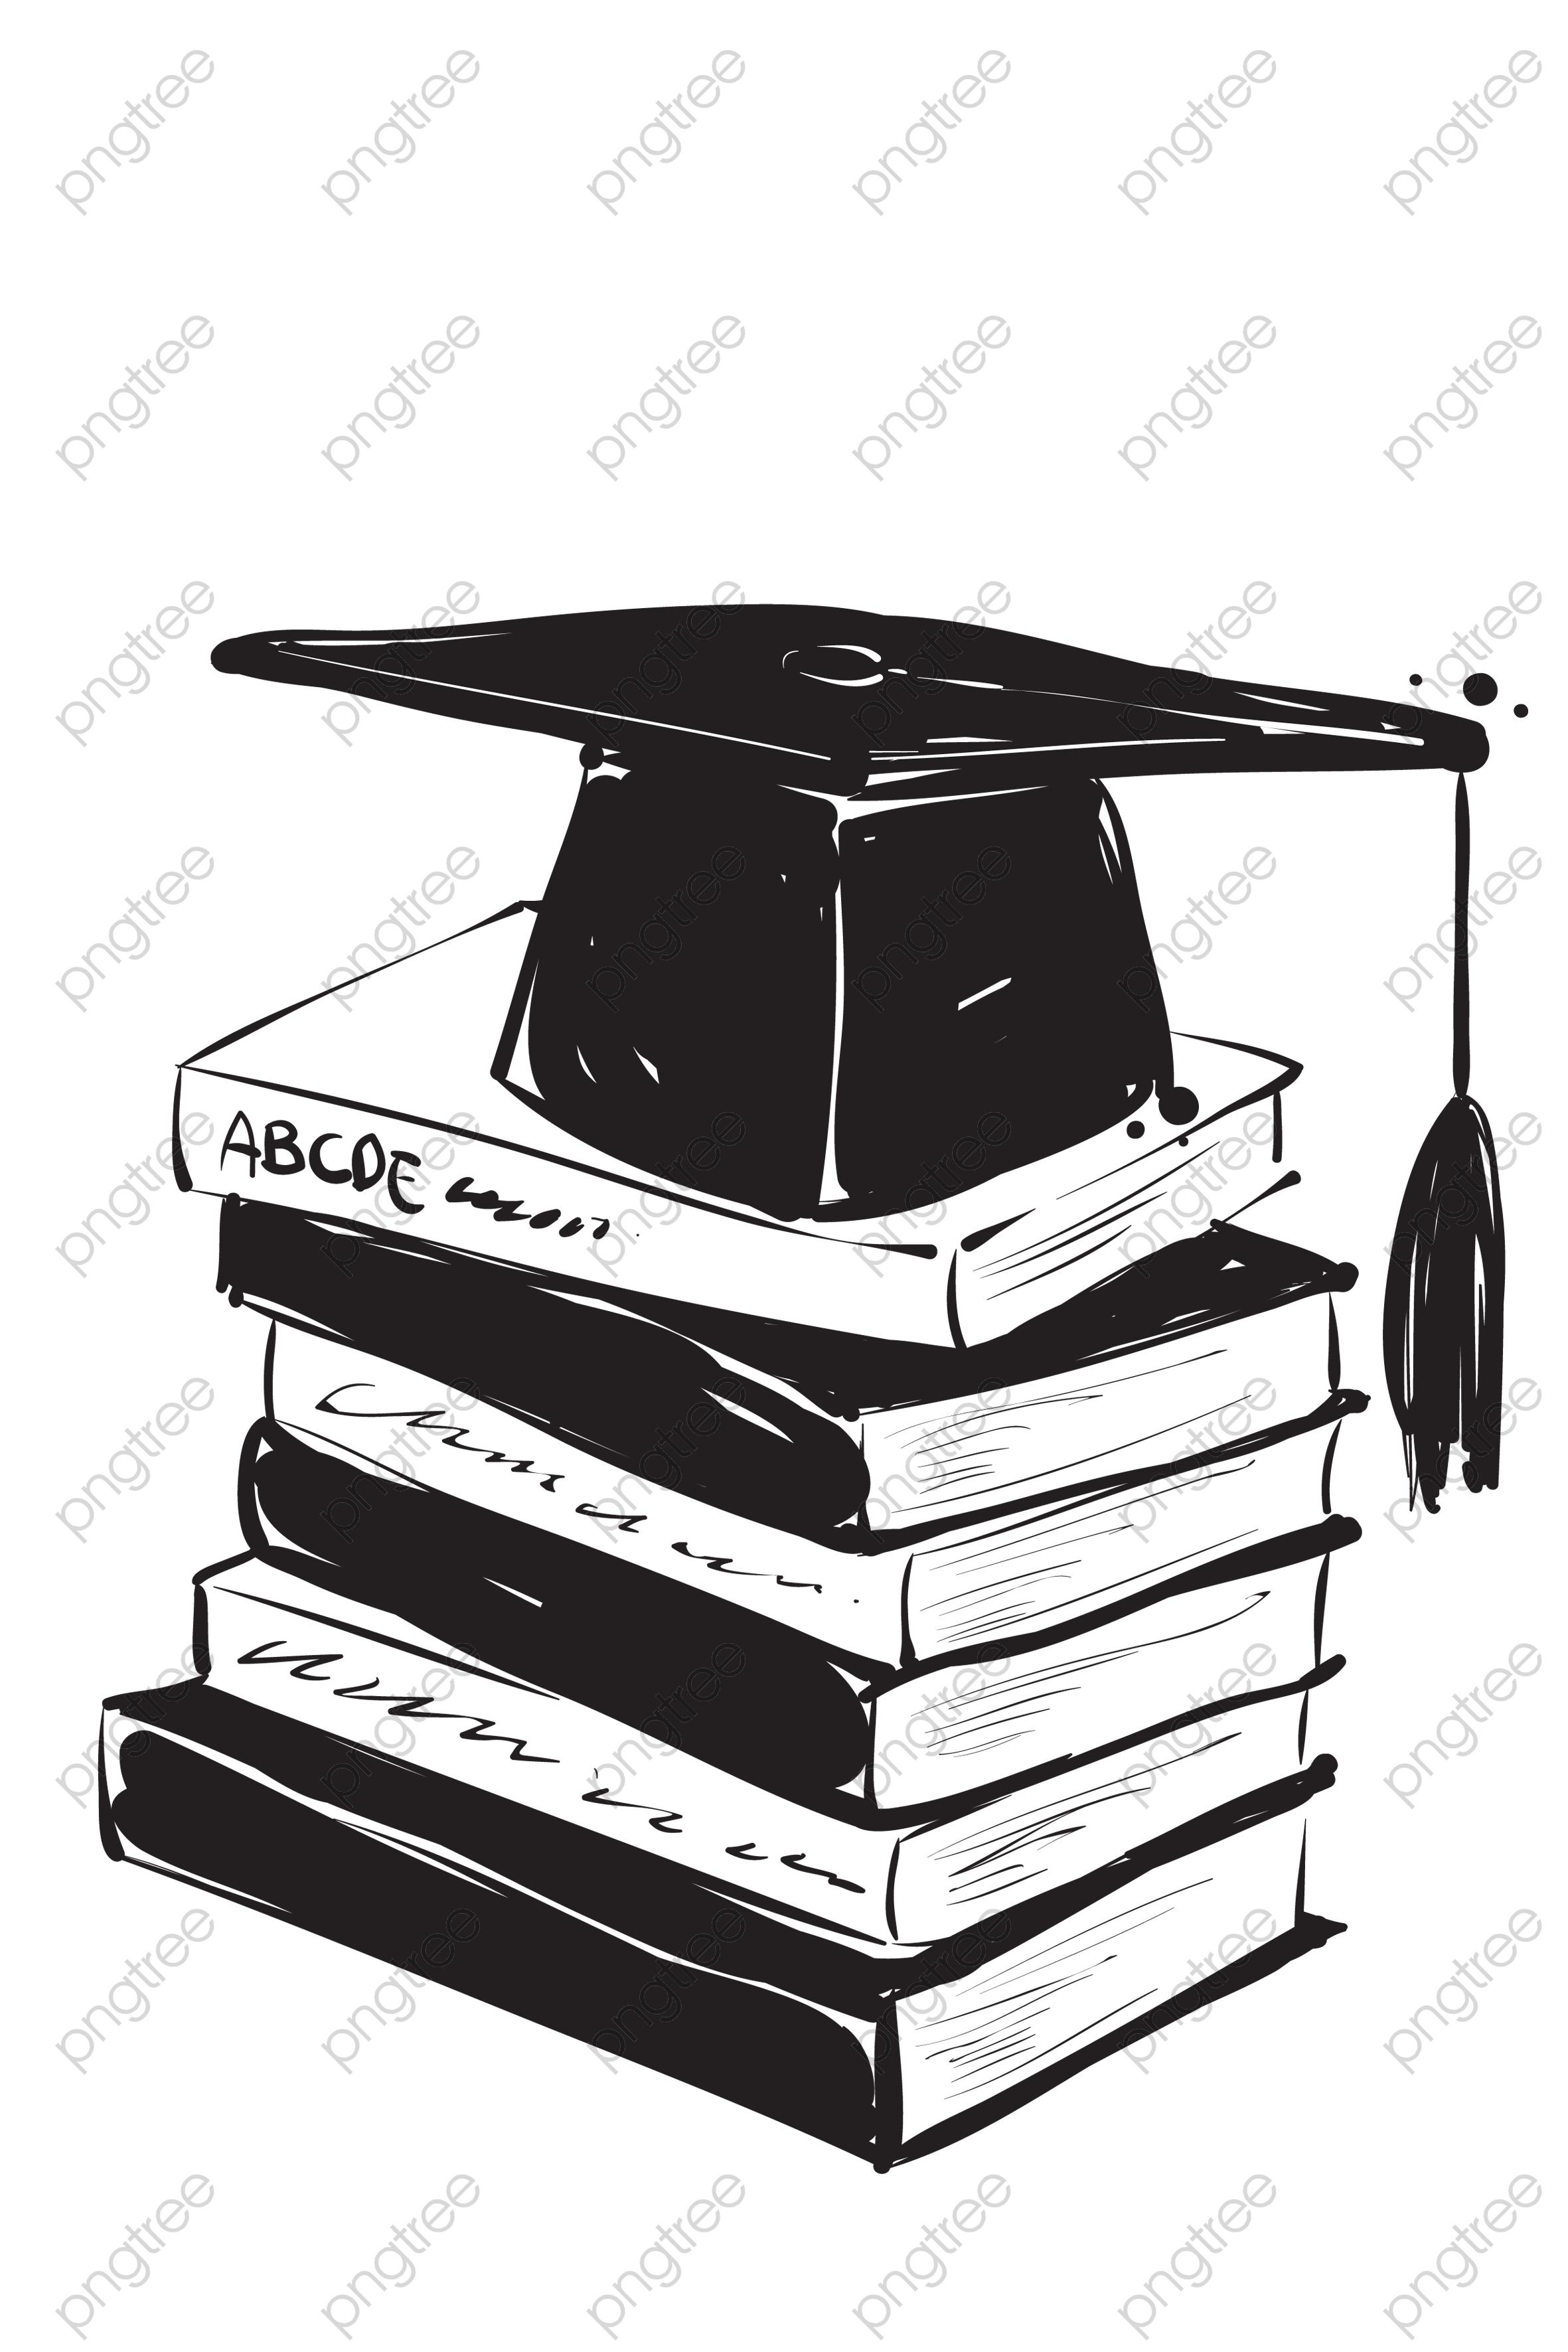 Book Hat Bachelor Cap Graduation Season Element Png Clipart Graduation Art Graduation Wallpaper Graduation Drawing